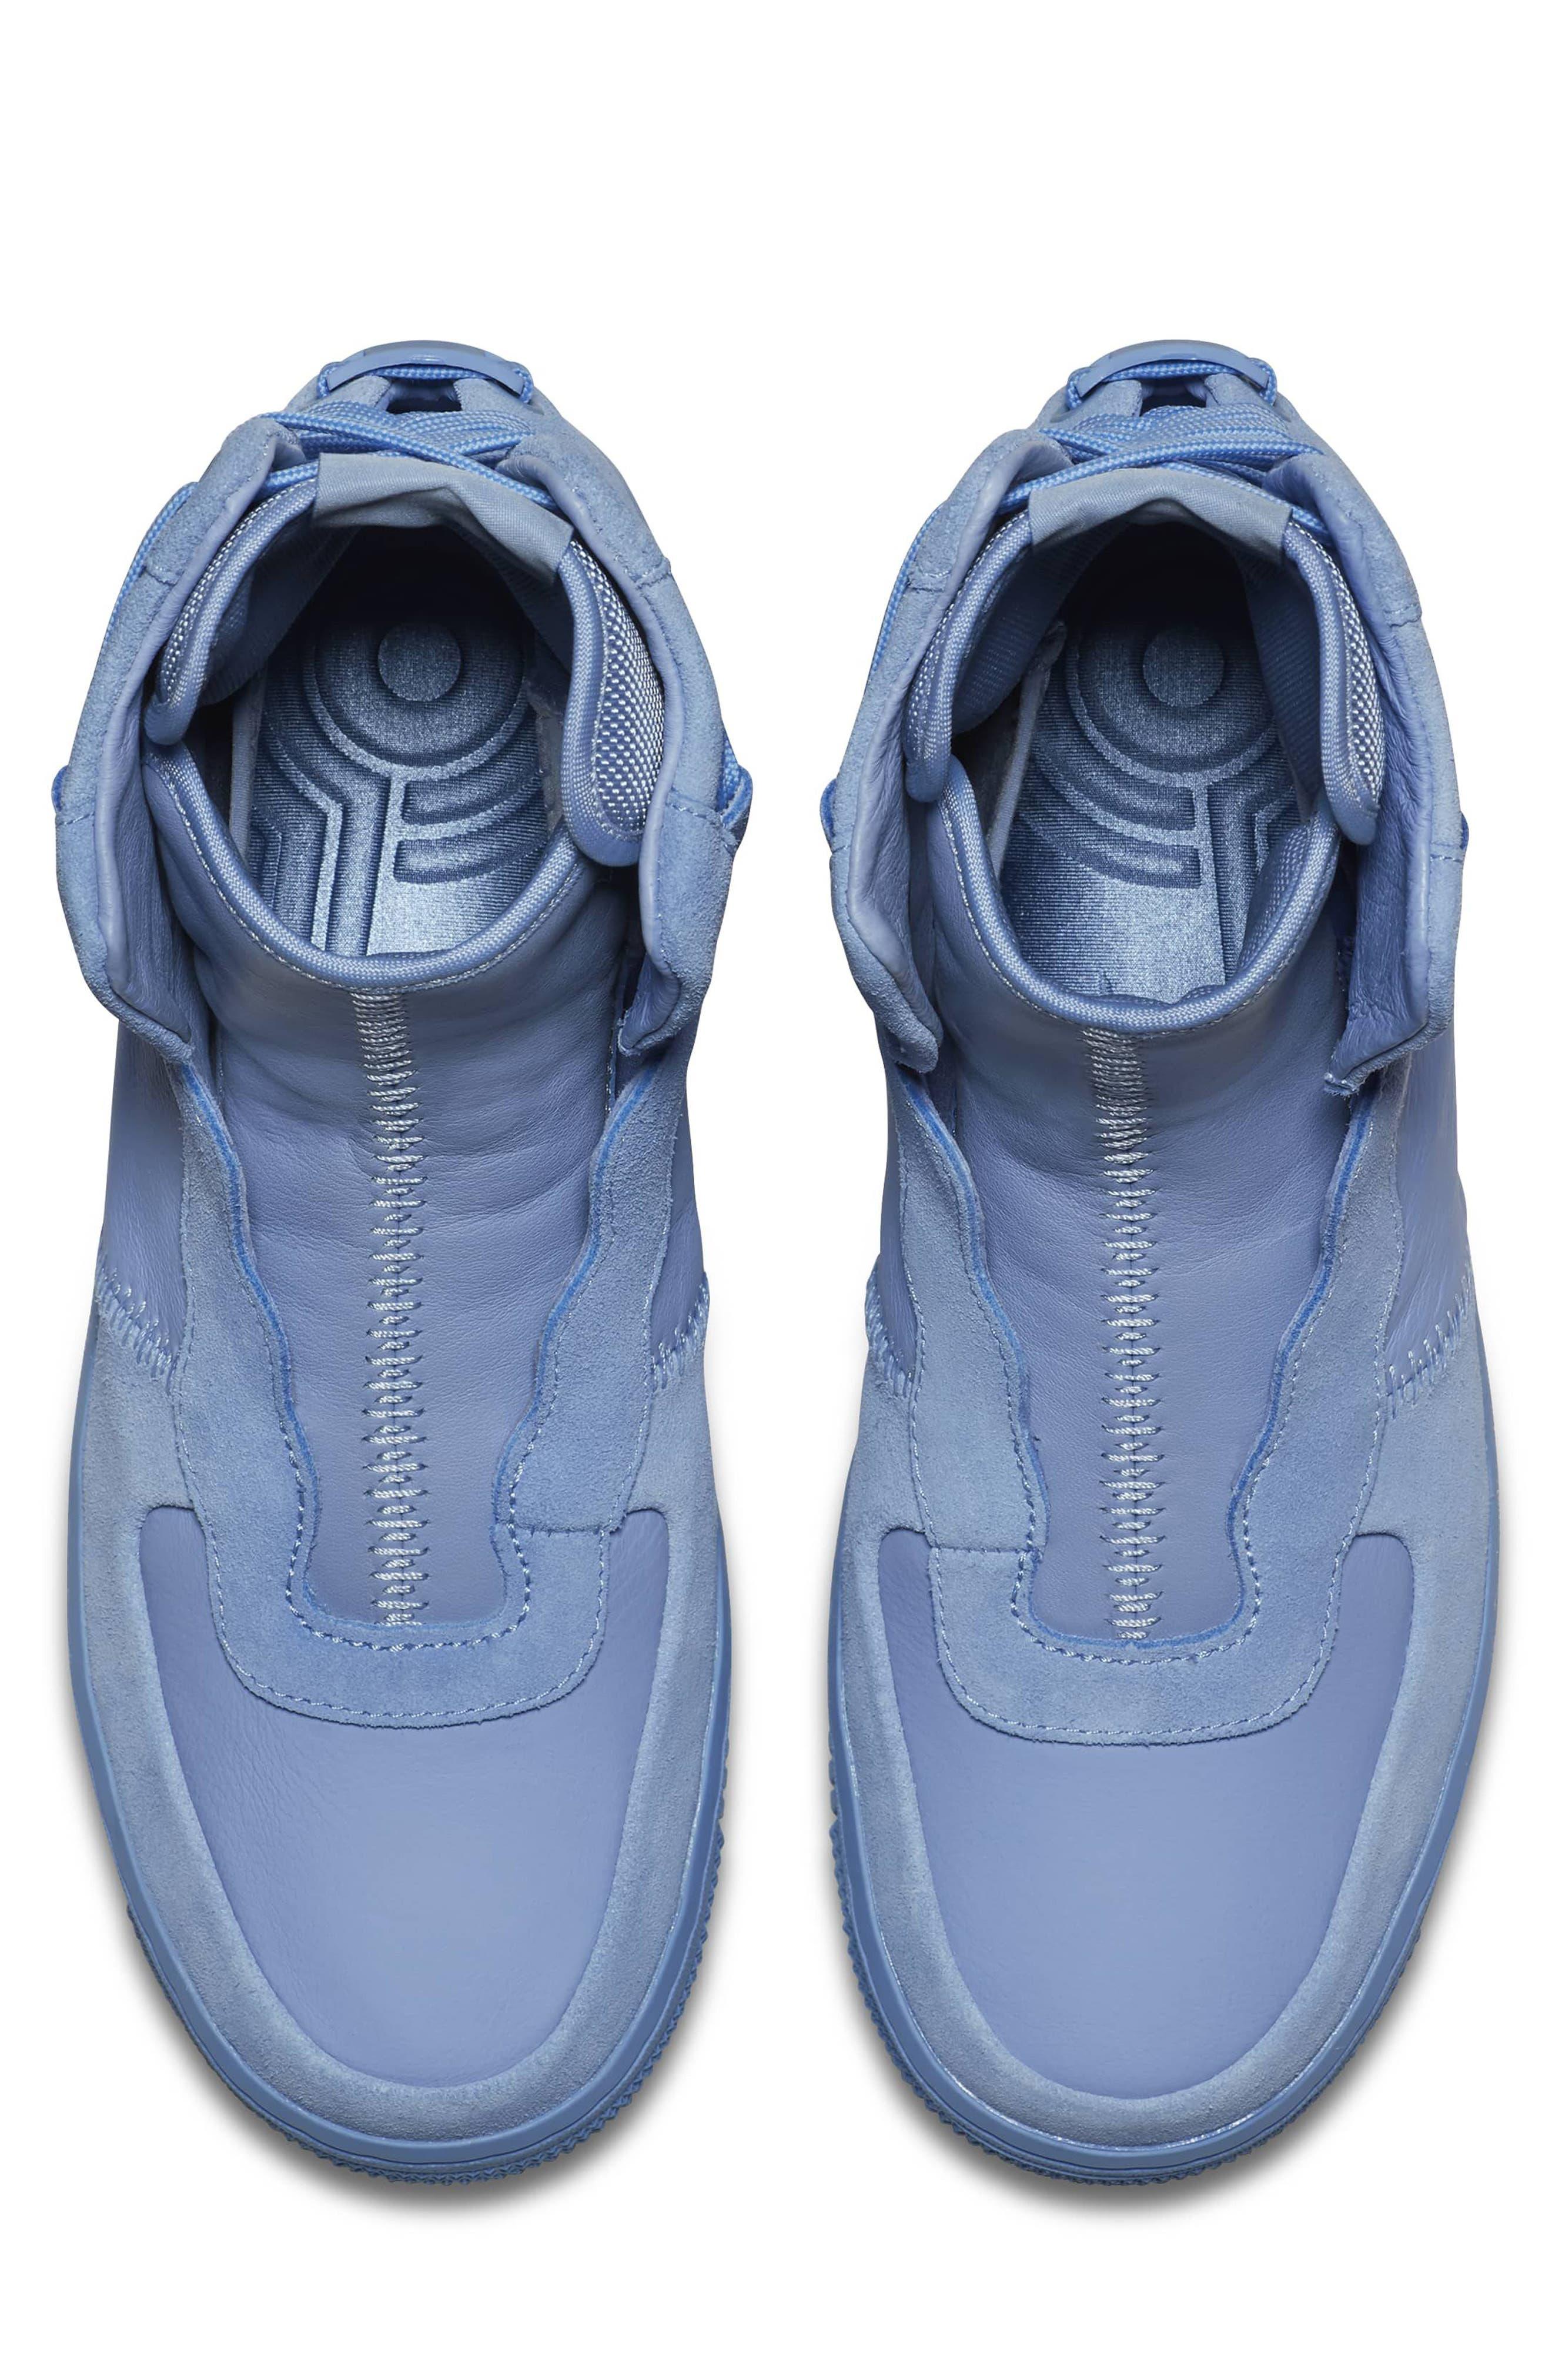 Air Force 1 Rebel XX High Top Sneaker,                             Alternate thumbnail 4, color,                             Light Blue